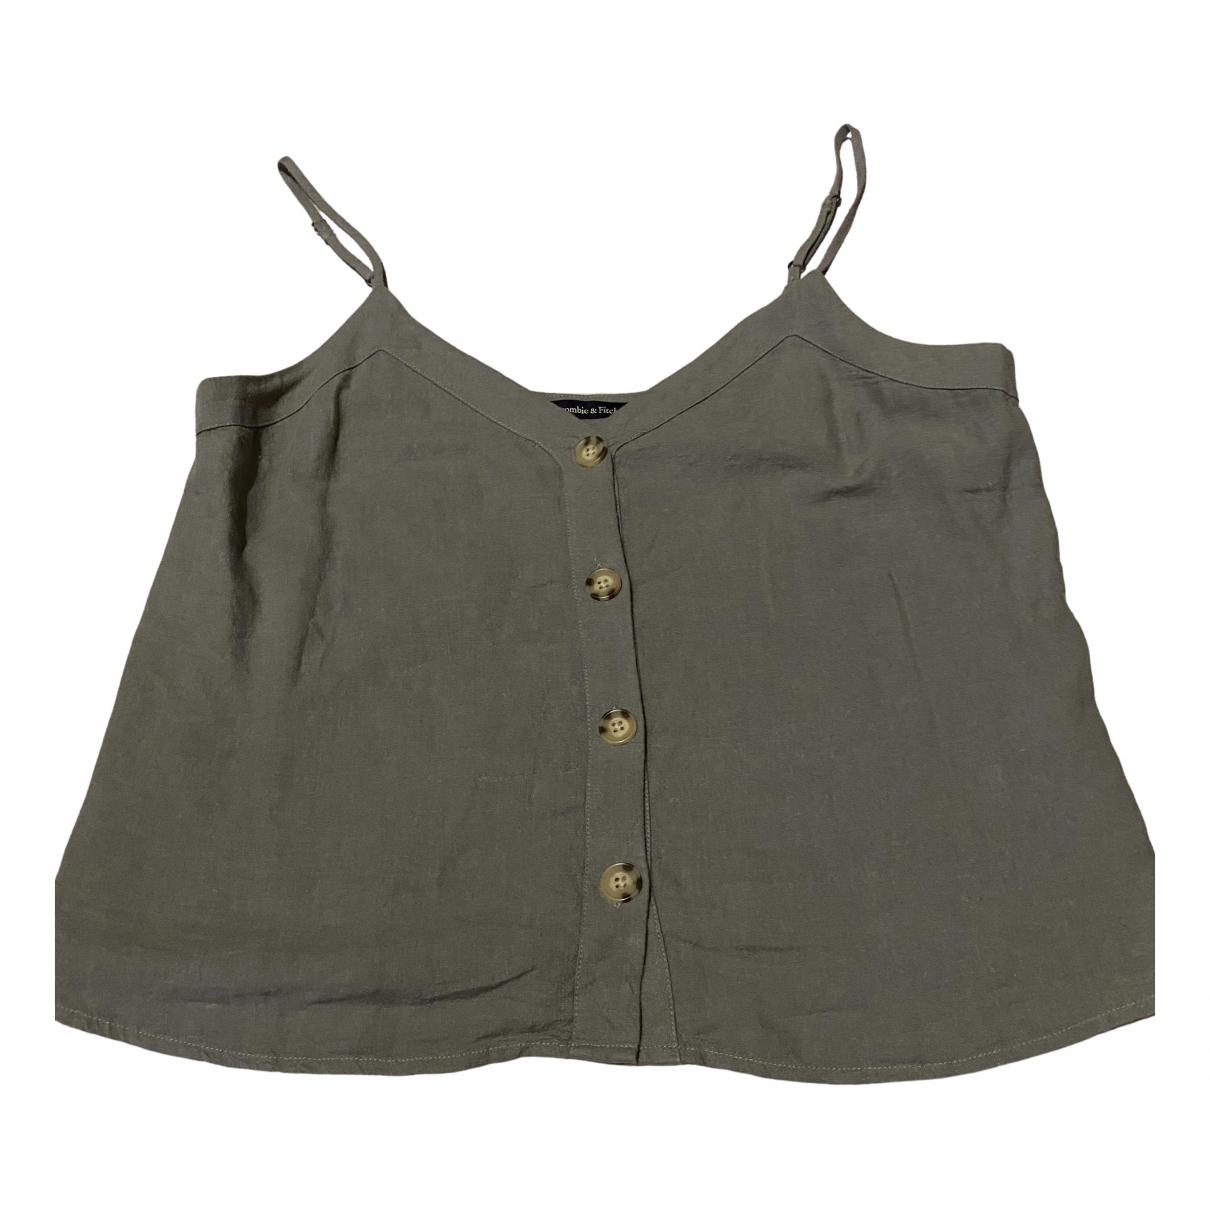 Abercrombie & Fitch \N Khaki Linen  top for Women M International